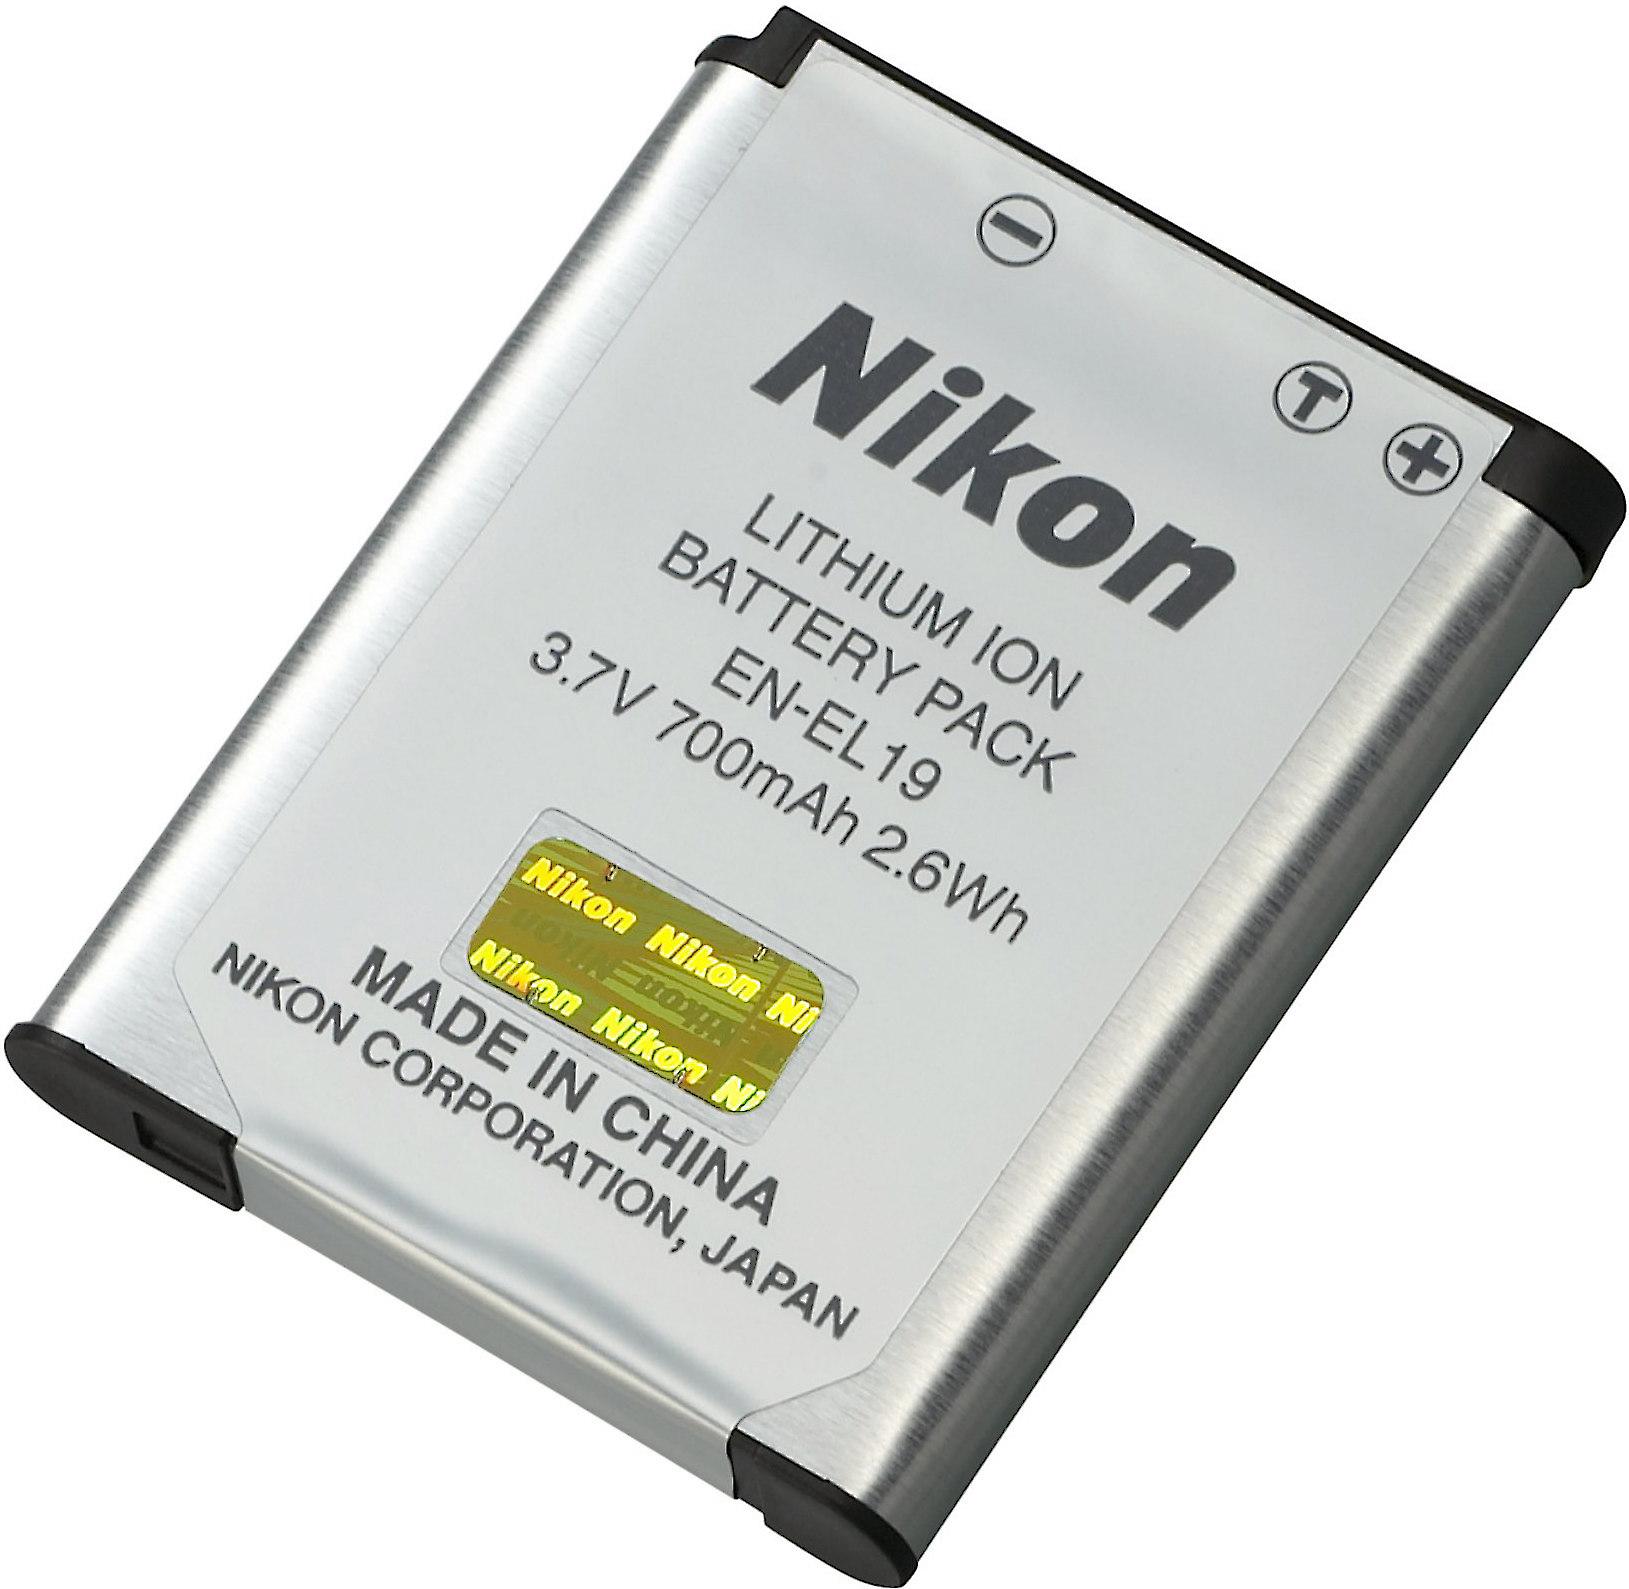 a2a8f3b9fed Nikon EN-EL19 Rechargeable lithium ion battery for select Nikon Coolpix  cameras at Crutchfield